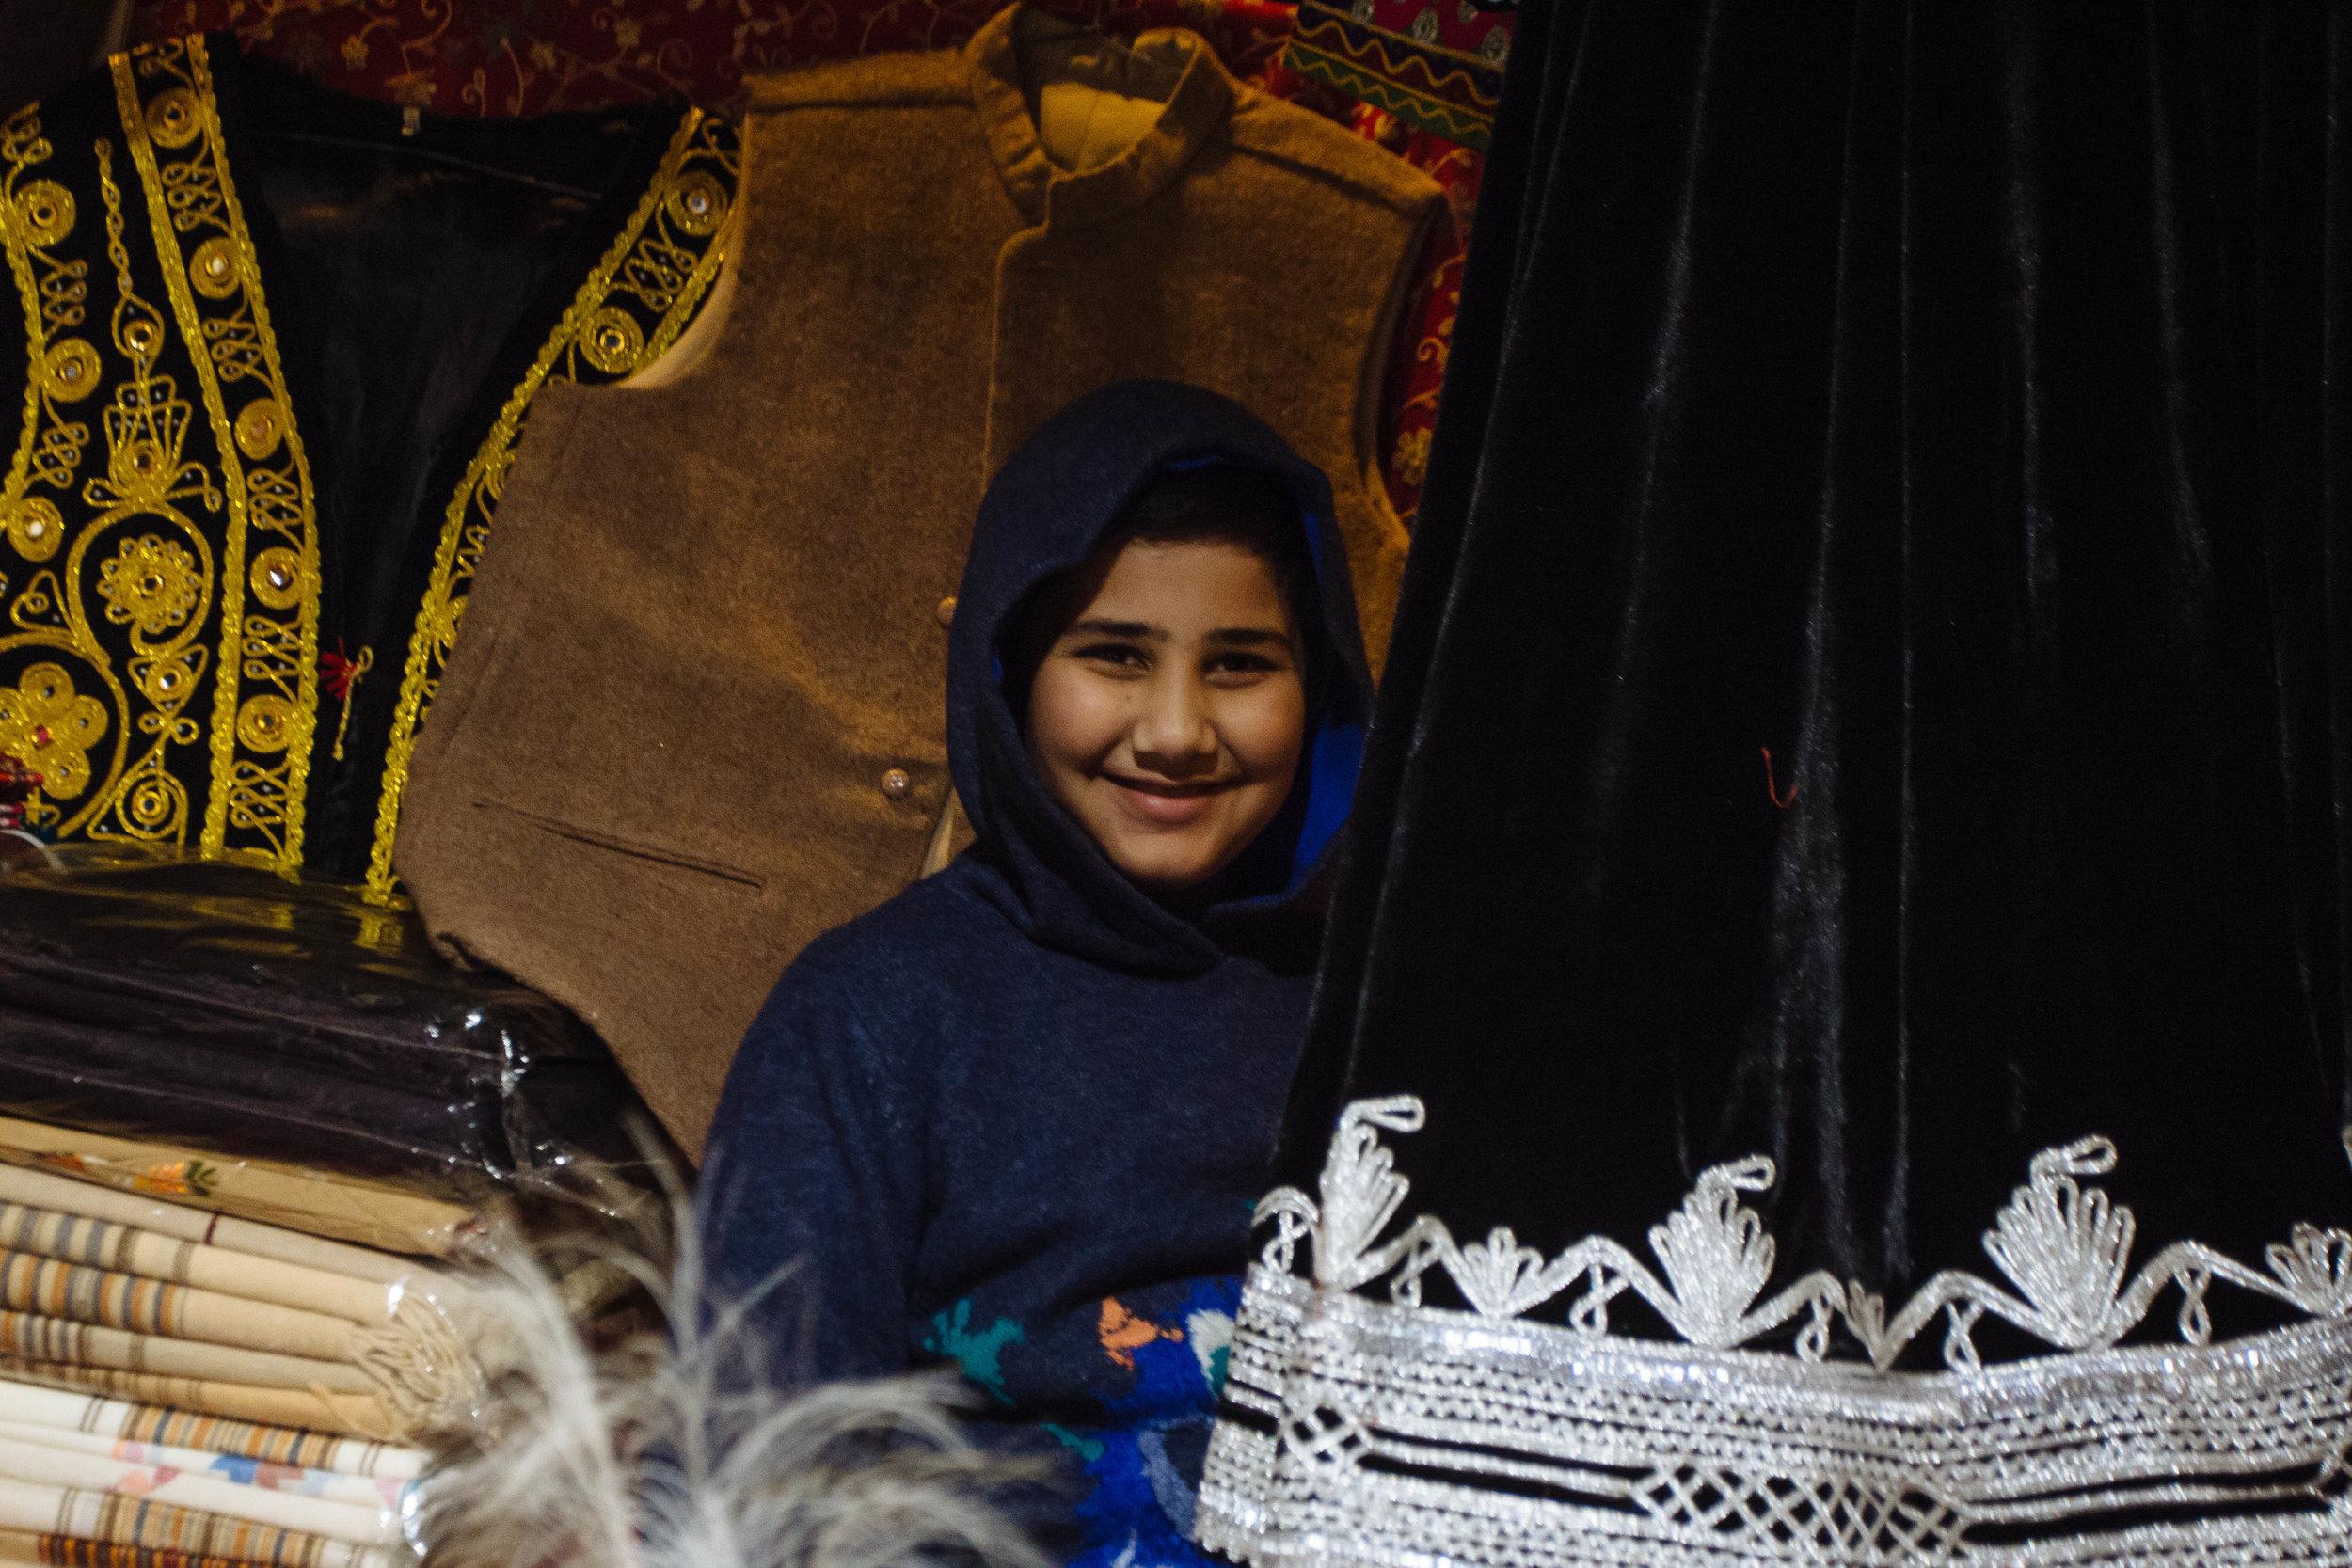 abdullah, my nephew and urdu teacher